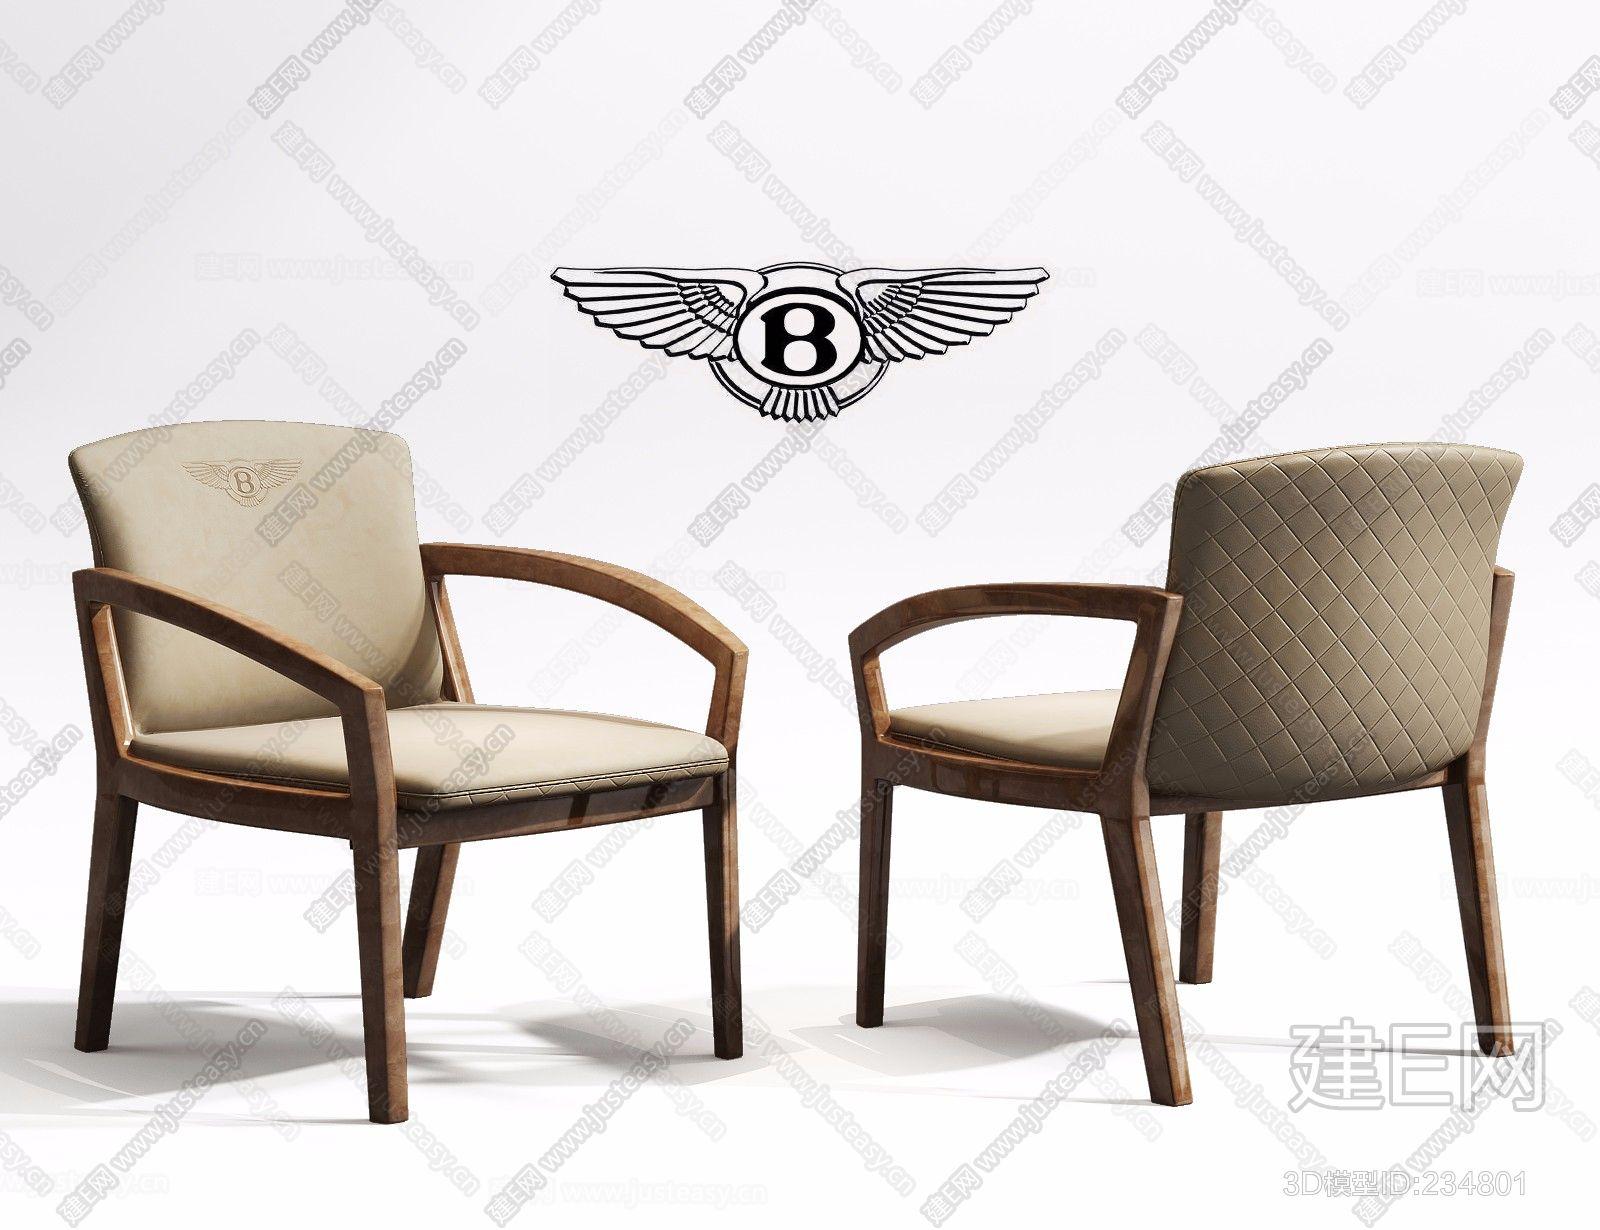 意大利宾利Bentley Home单人沙发ID:234801